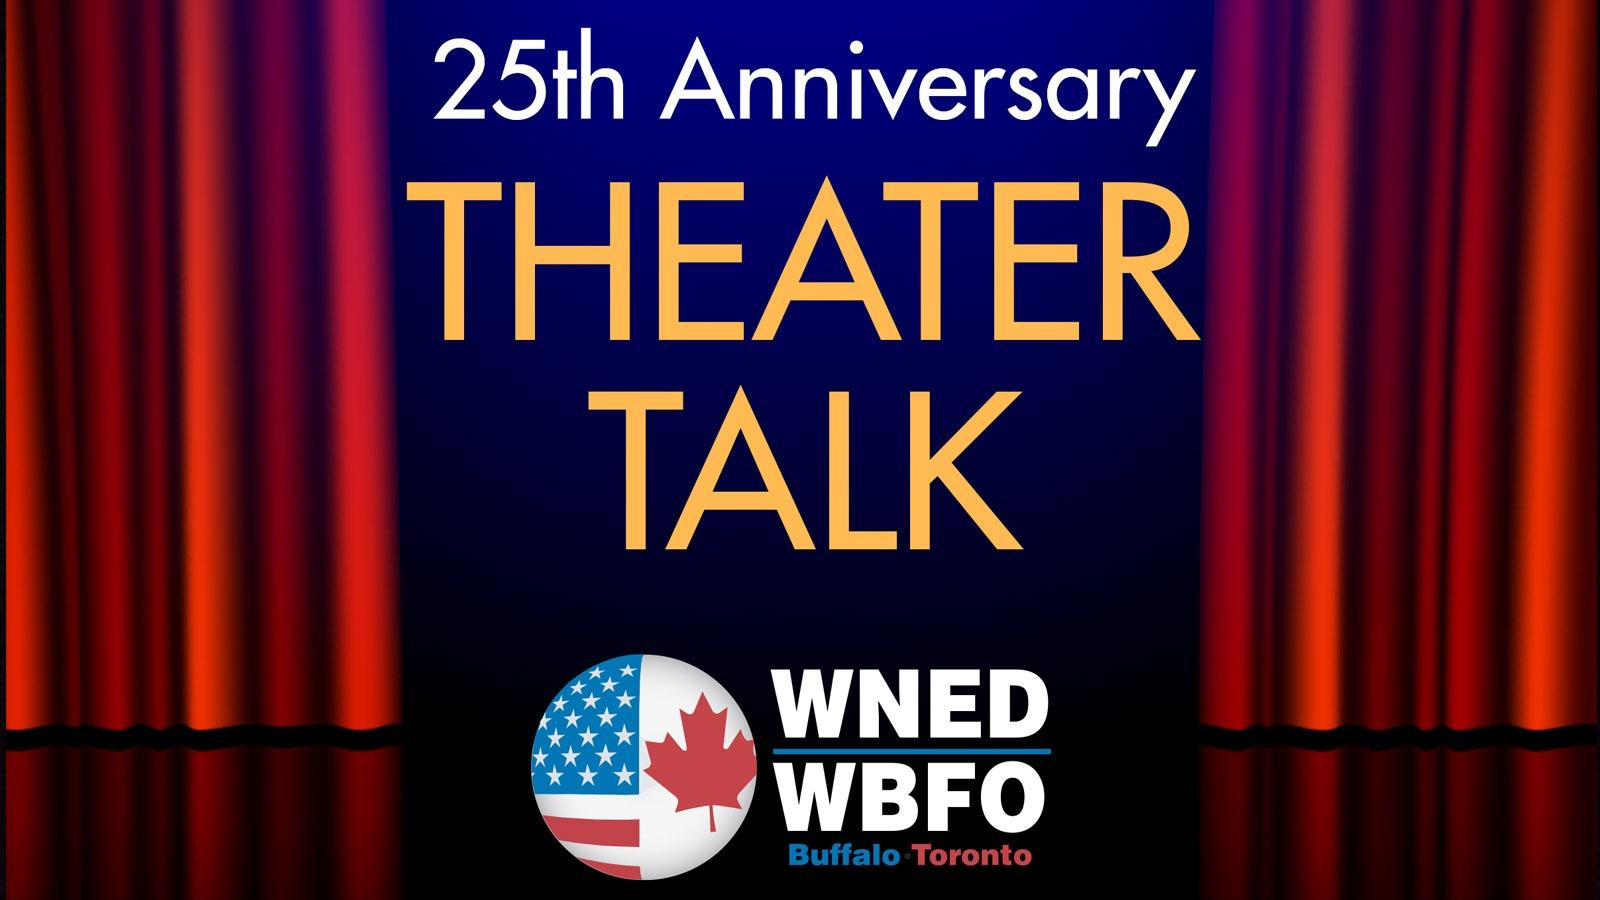 25th Anniversary of Theater Talk